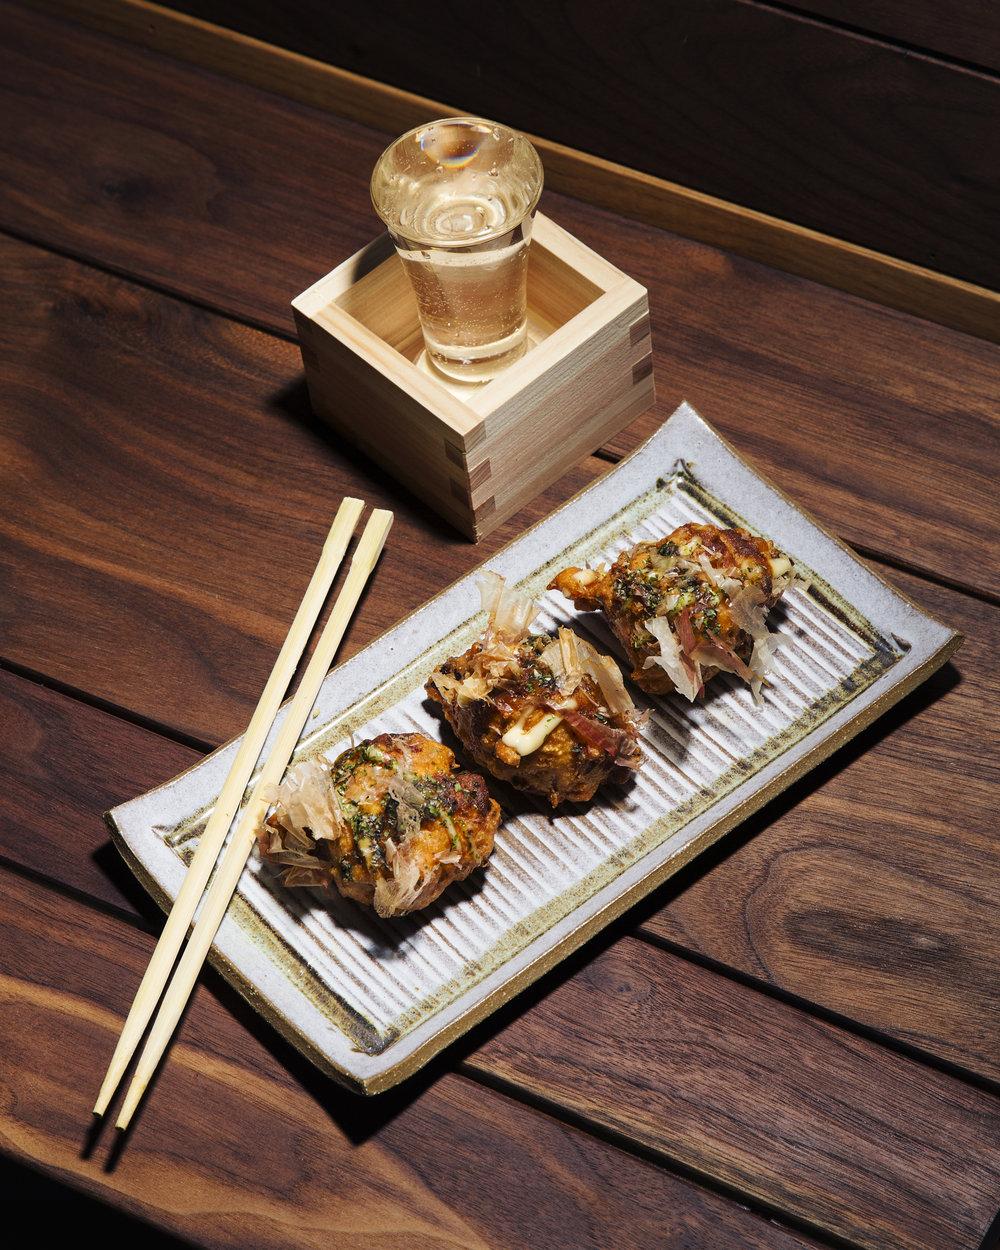 D.L. Anderson Pictures - Dashi - Takoyaki Hushpuppies.jpg